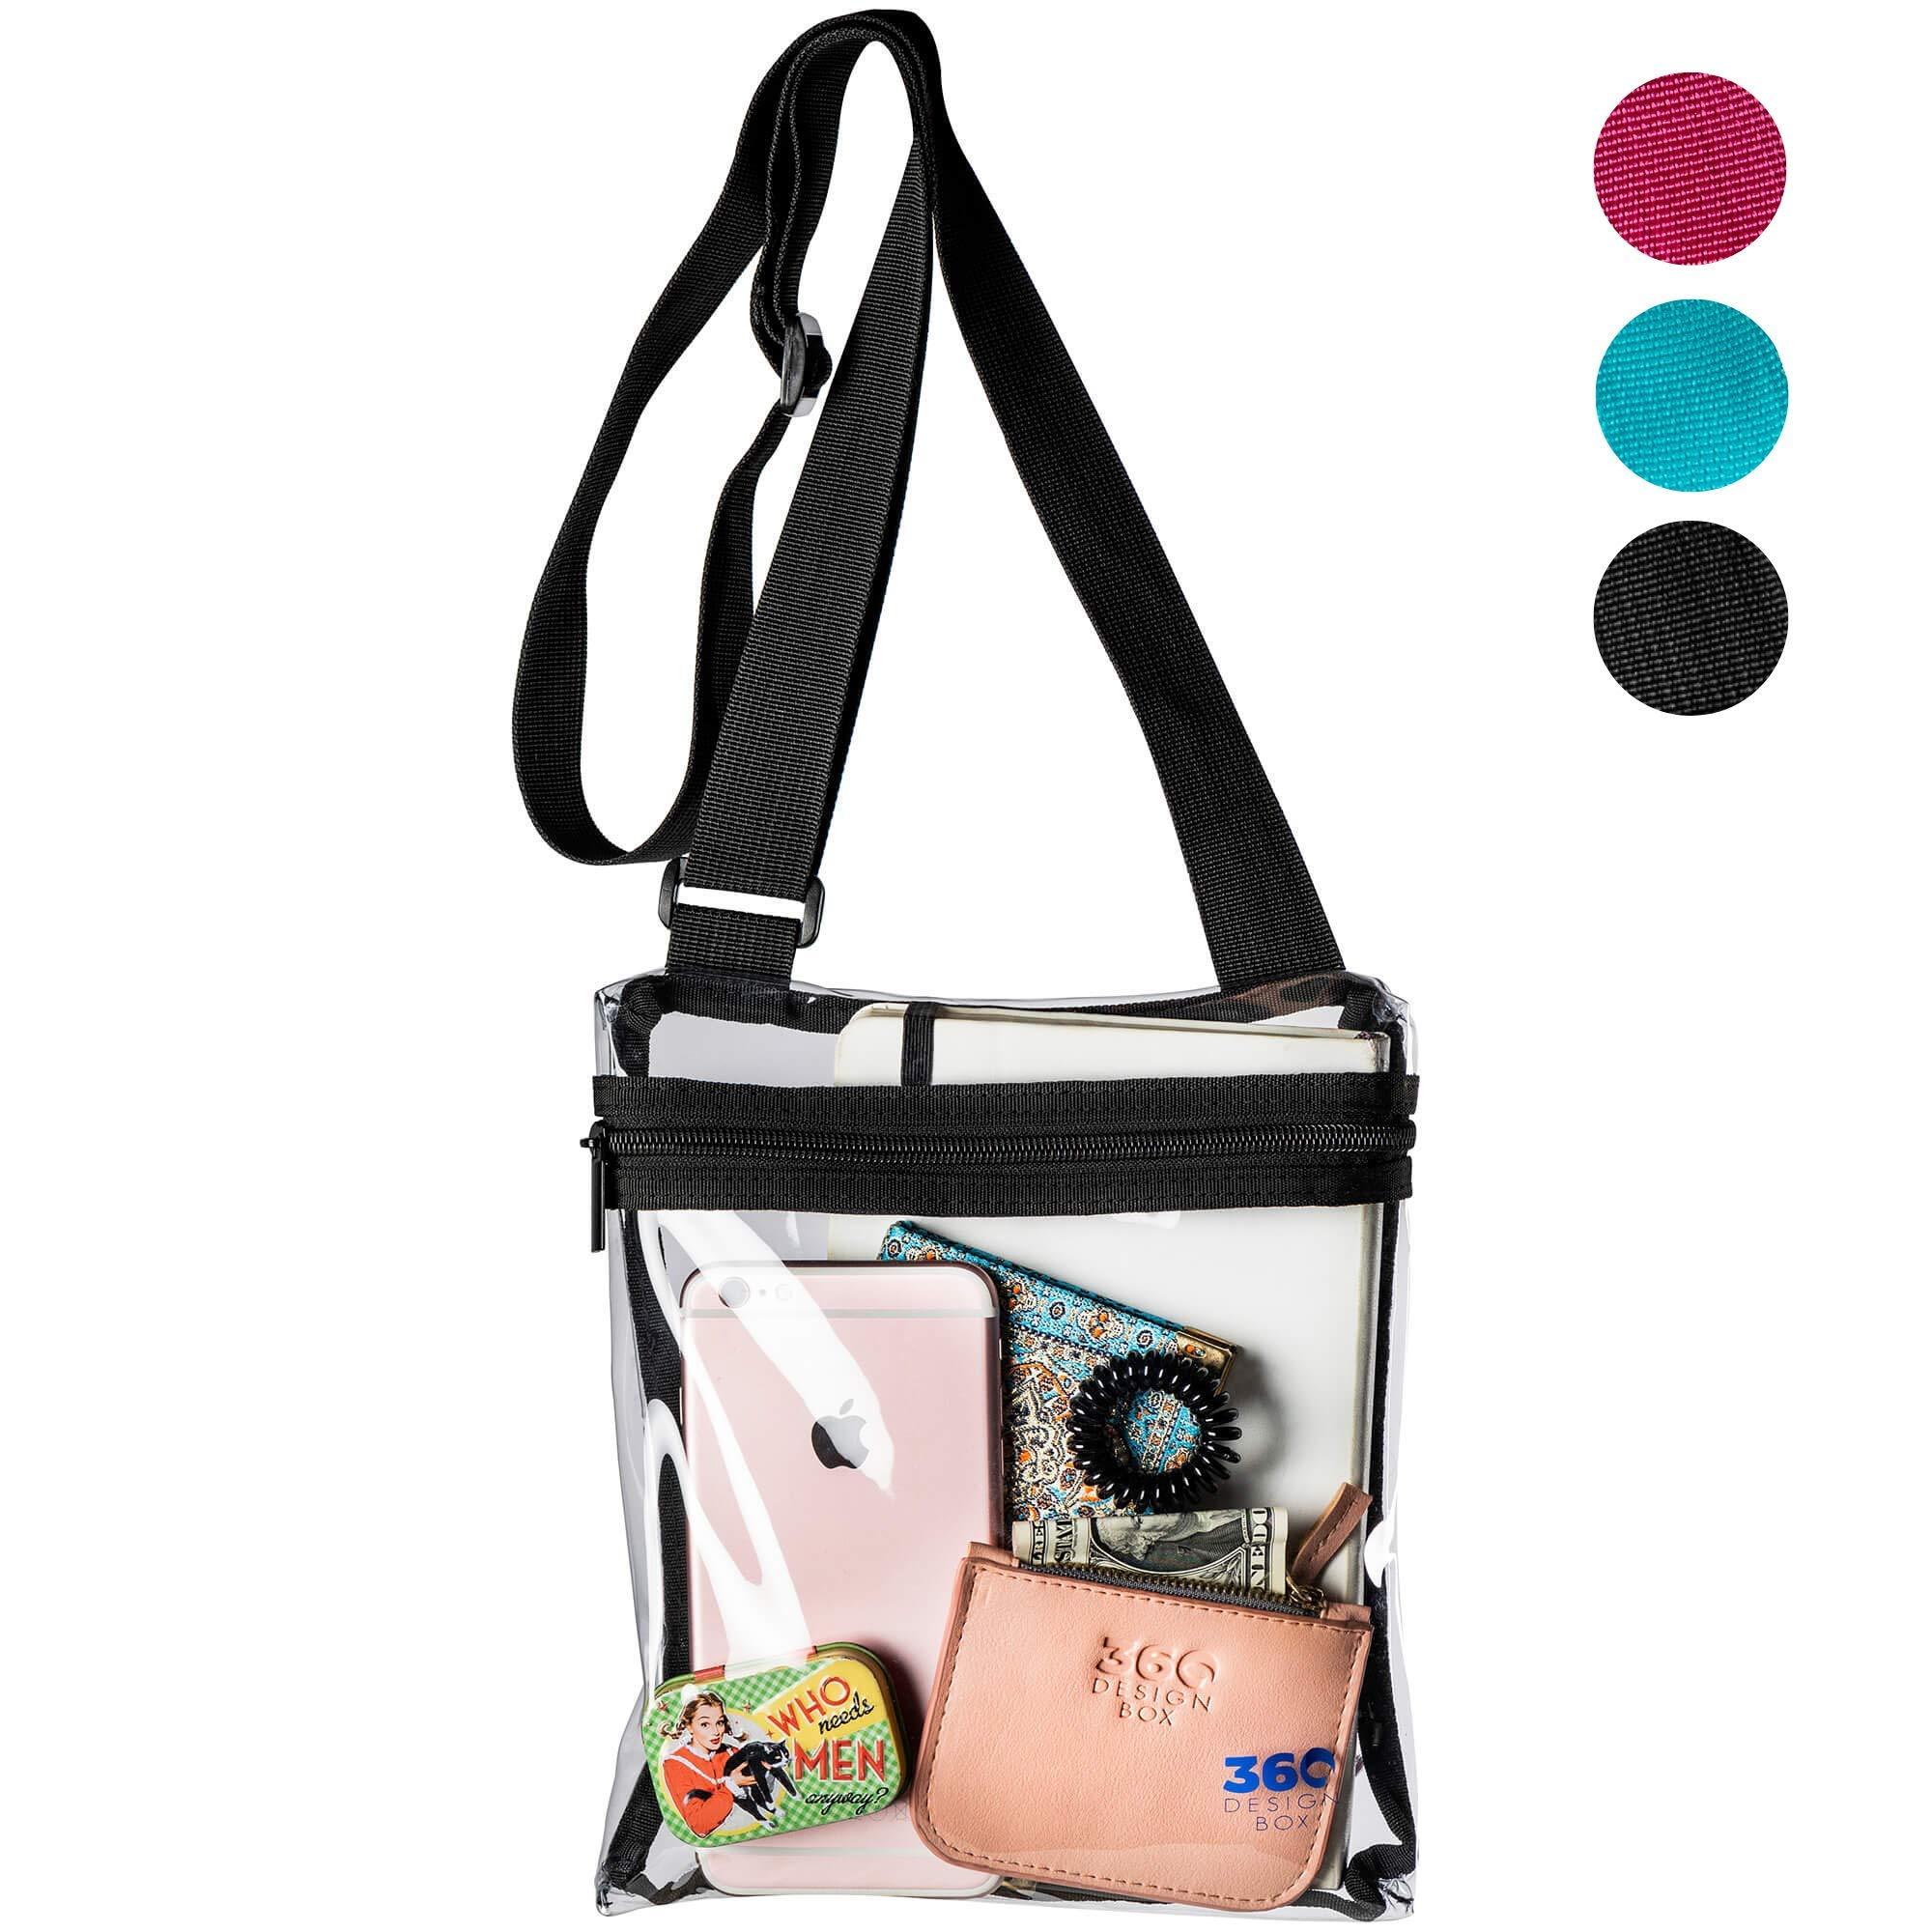 GreenPine Clear Messenger Bag for Work /& Business Travel for Men /& Women,NFL Stadium Approved Transparent Cross-Body Shoulder Bag for Security /& Sporting Event C-Large